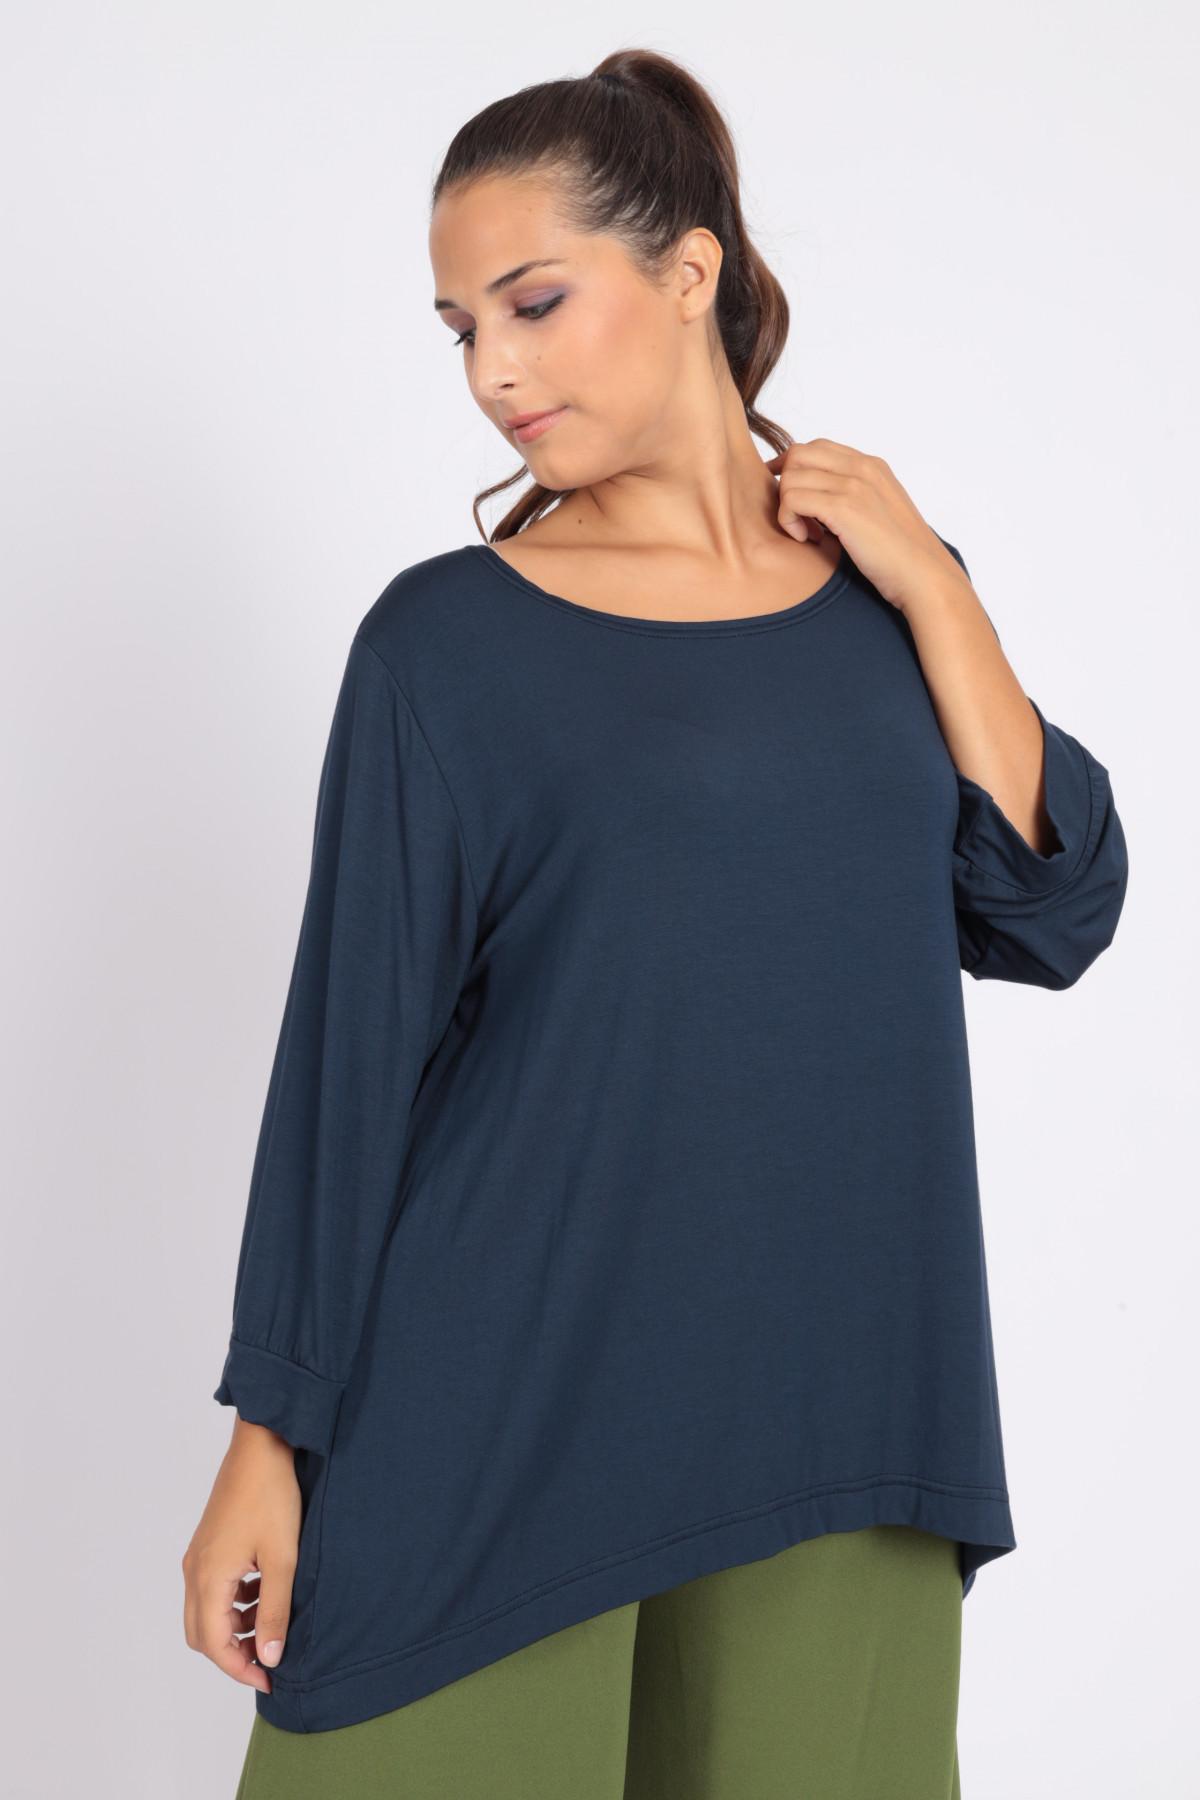 Long Sleeve Over T-Shirt Asymmetrical Bottom